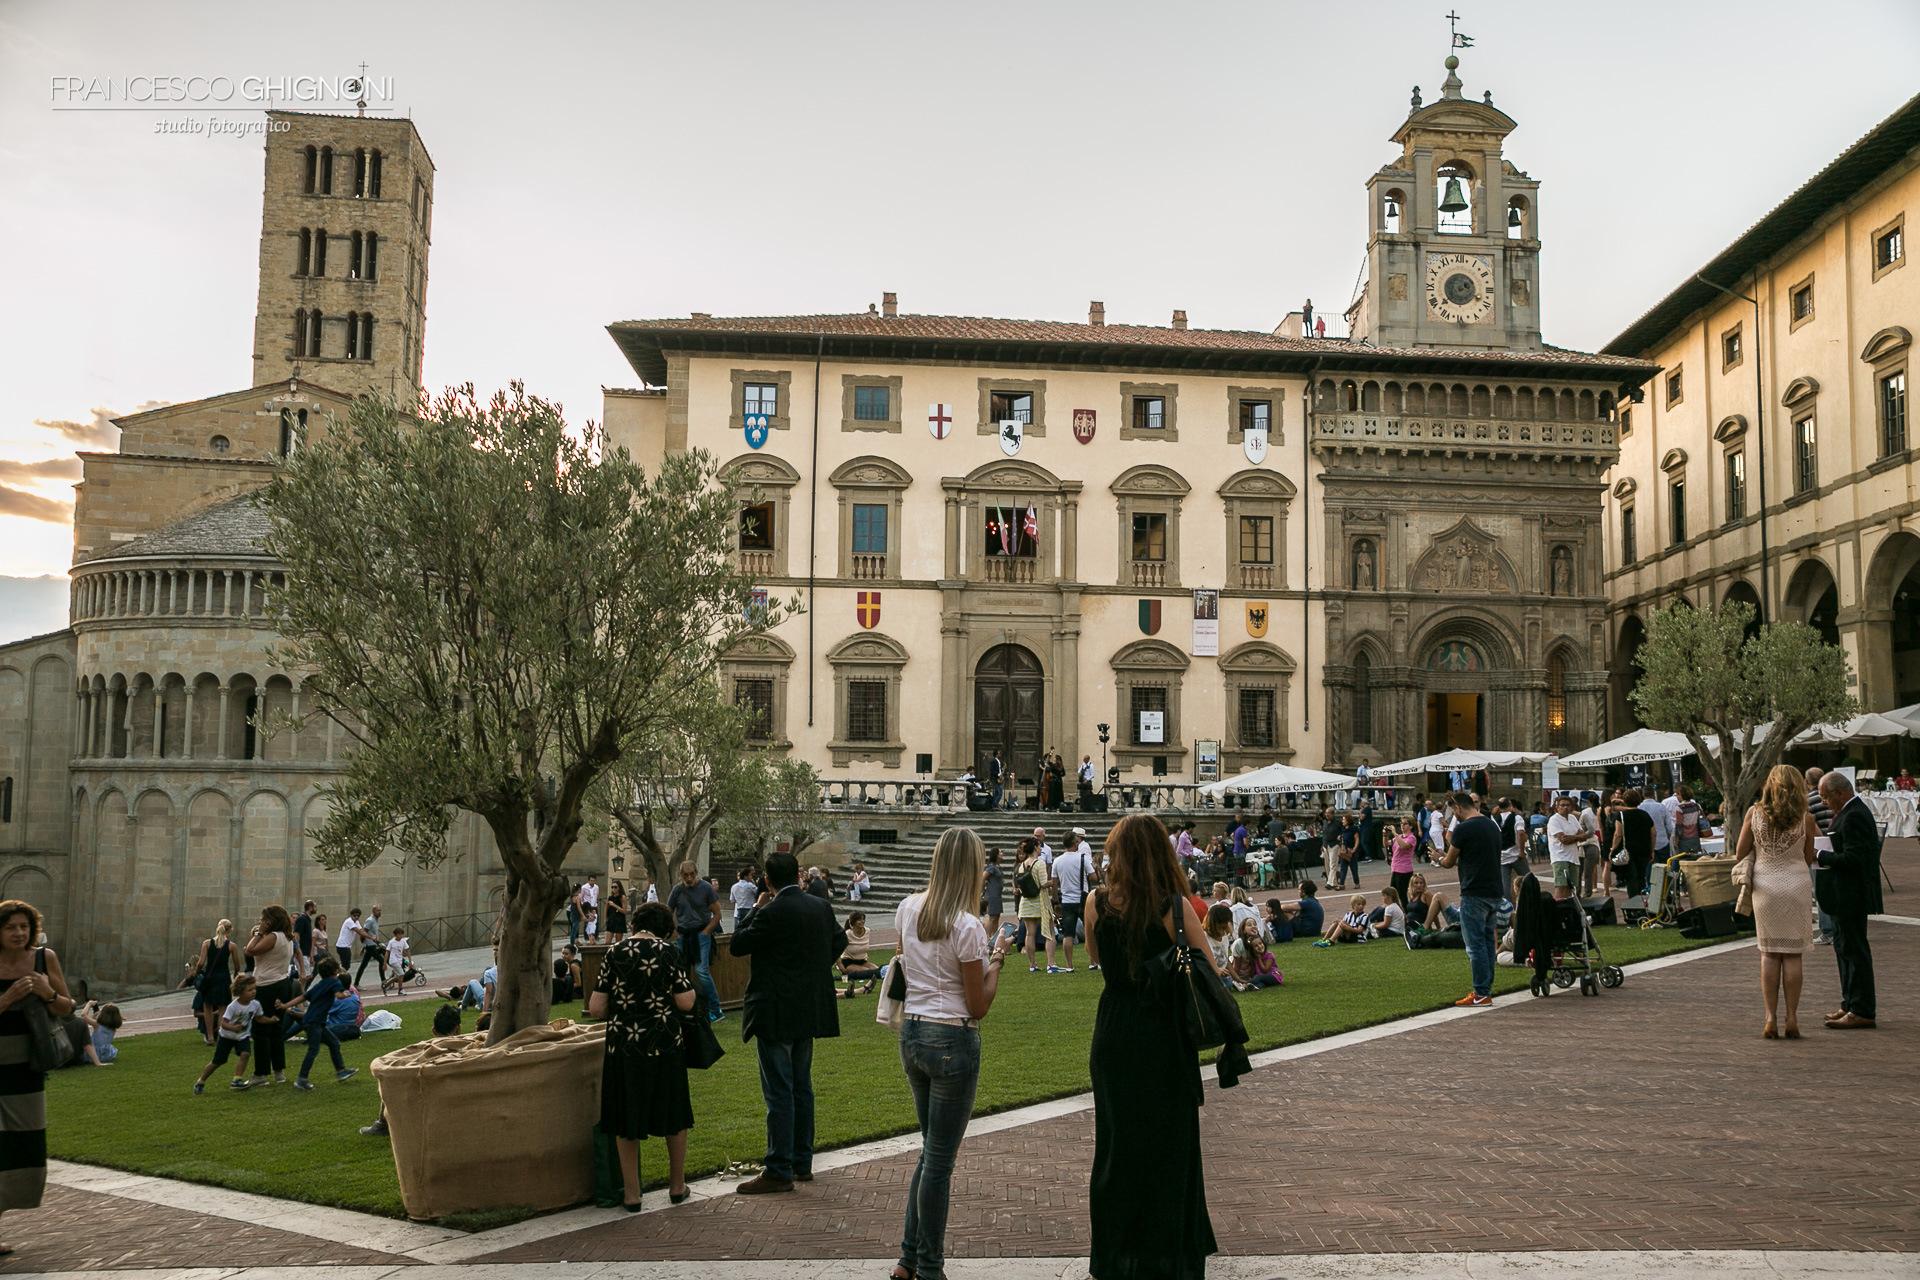 150820193515 - Foto Francesco Ghignoni